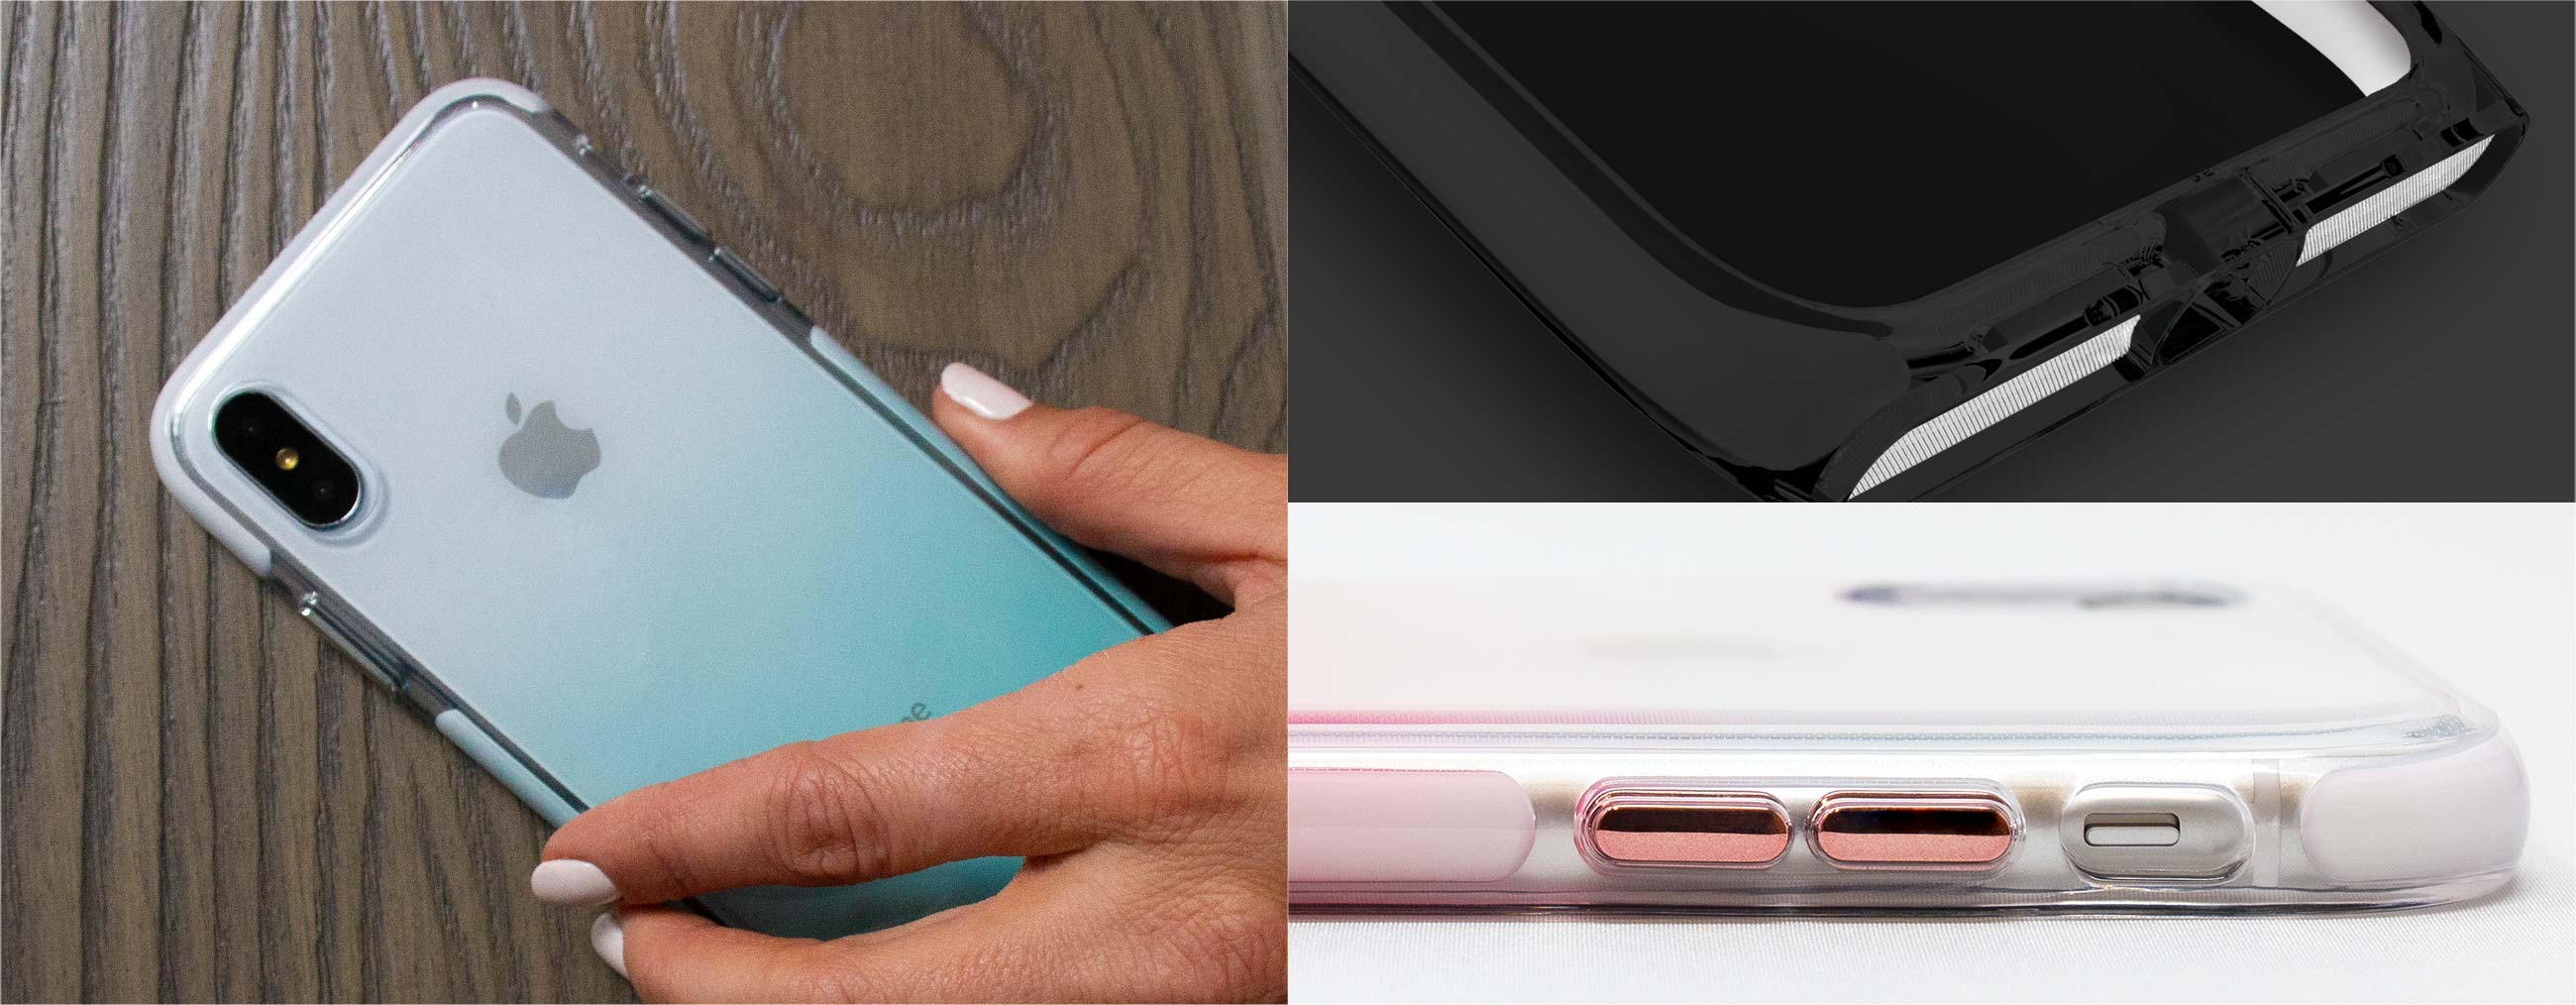 slidevue detail image